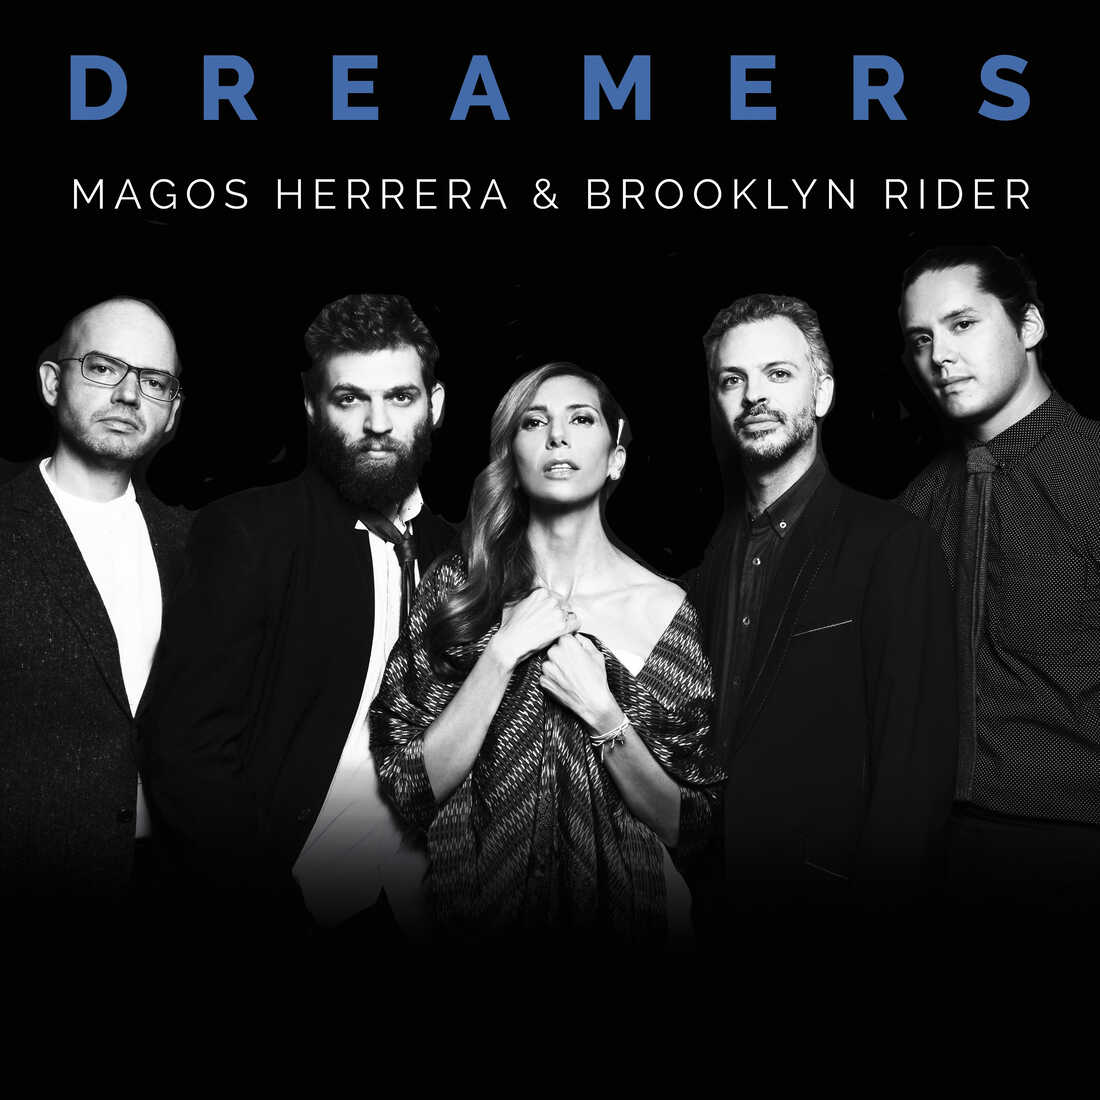 Magos Herrera & Brooklyn Rider, Dreamers